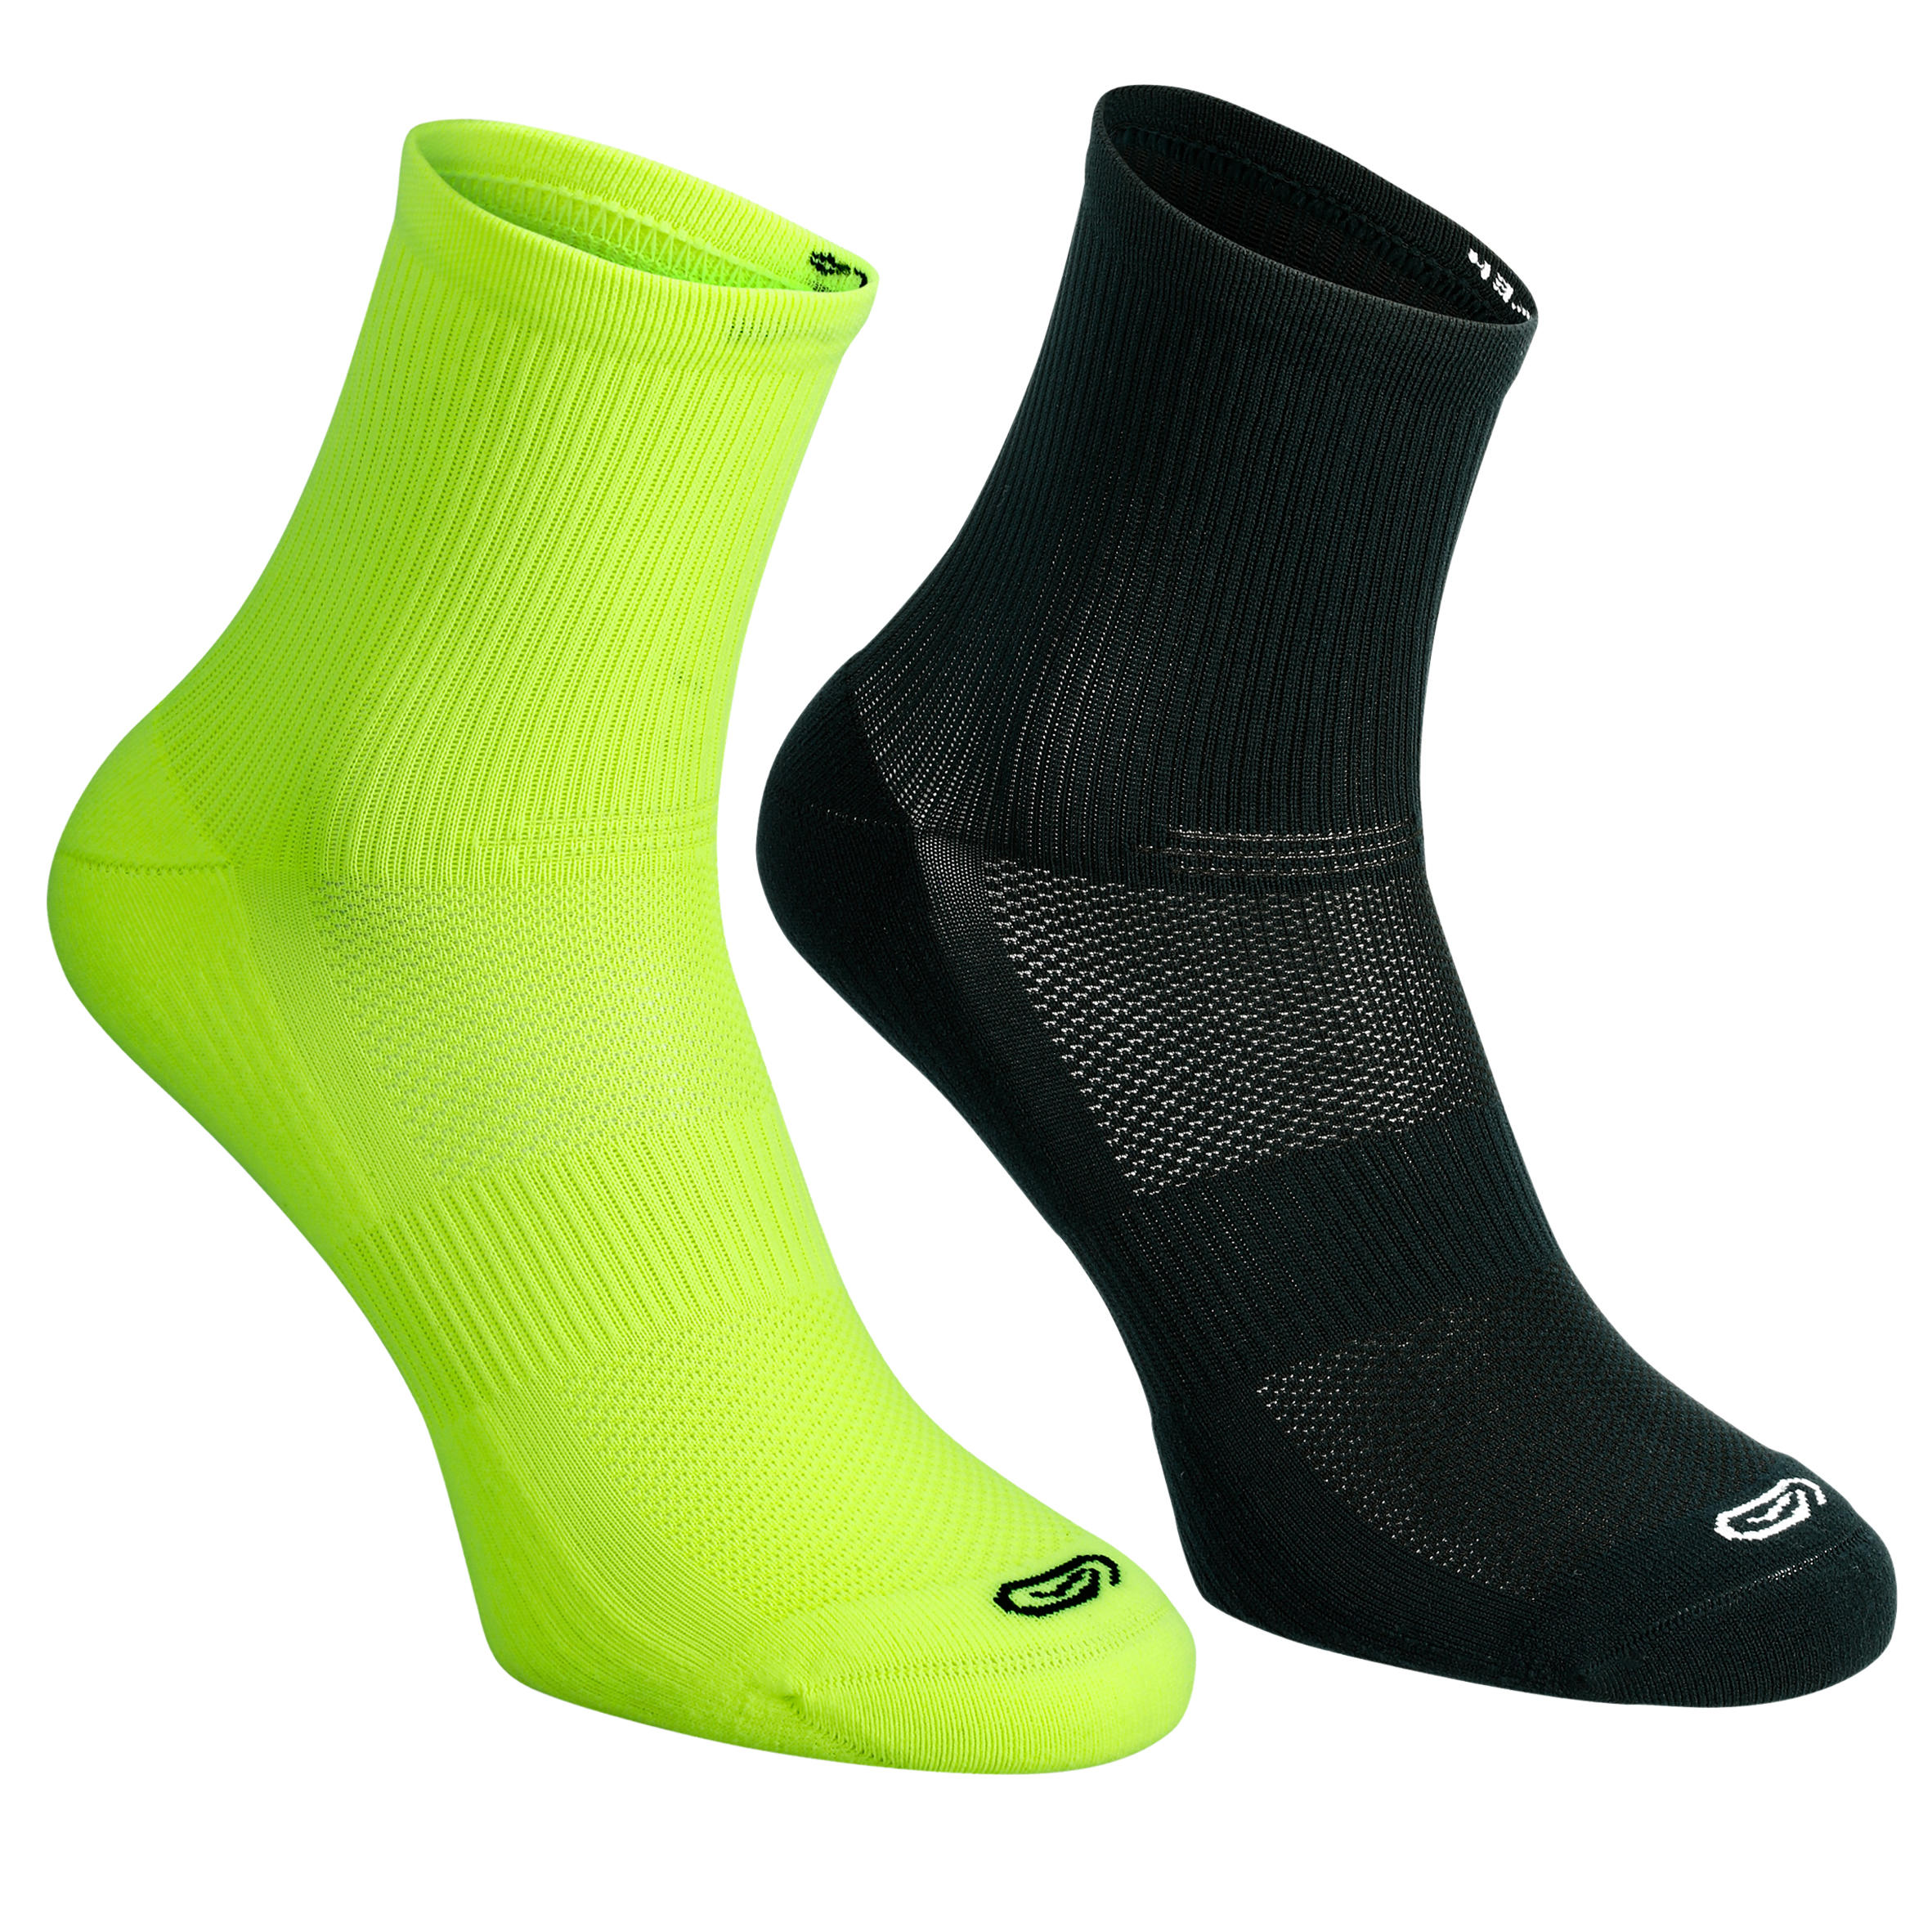 Pqt. de 2 calcetines de atletismo para niños confort tobillo alto AM fluo NG